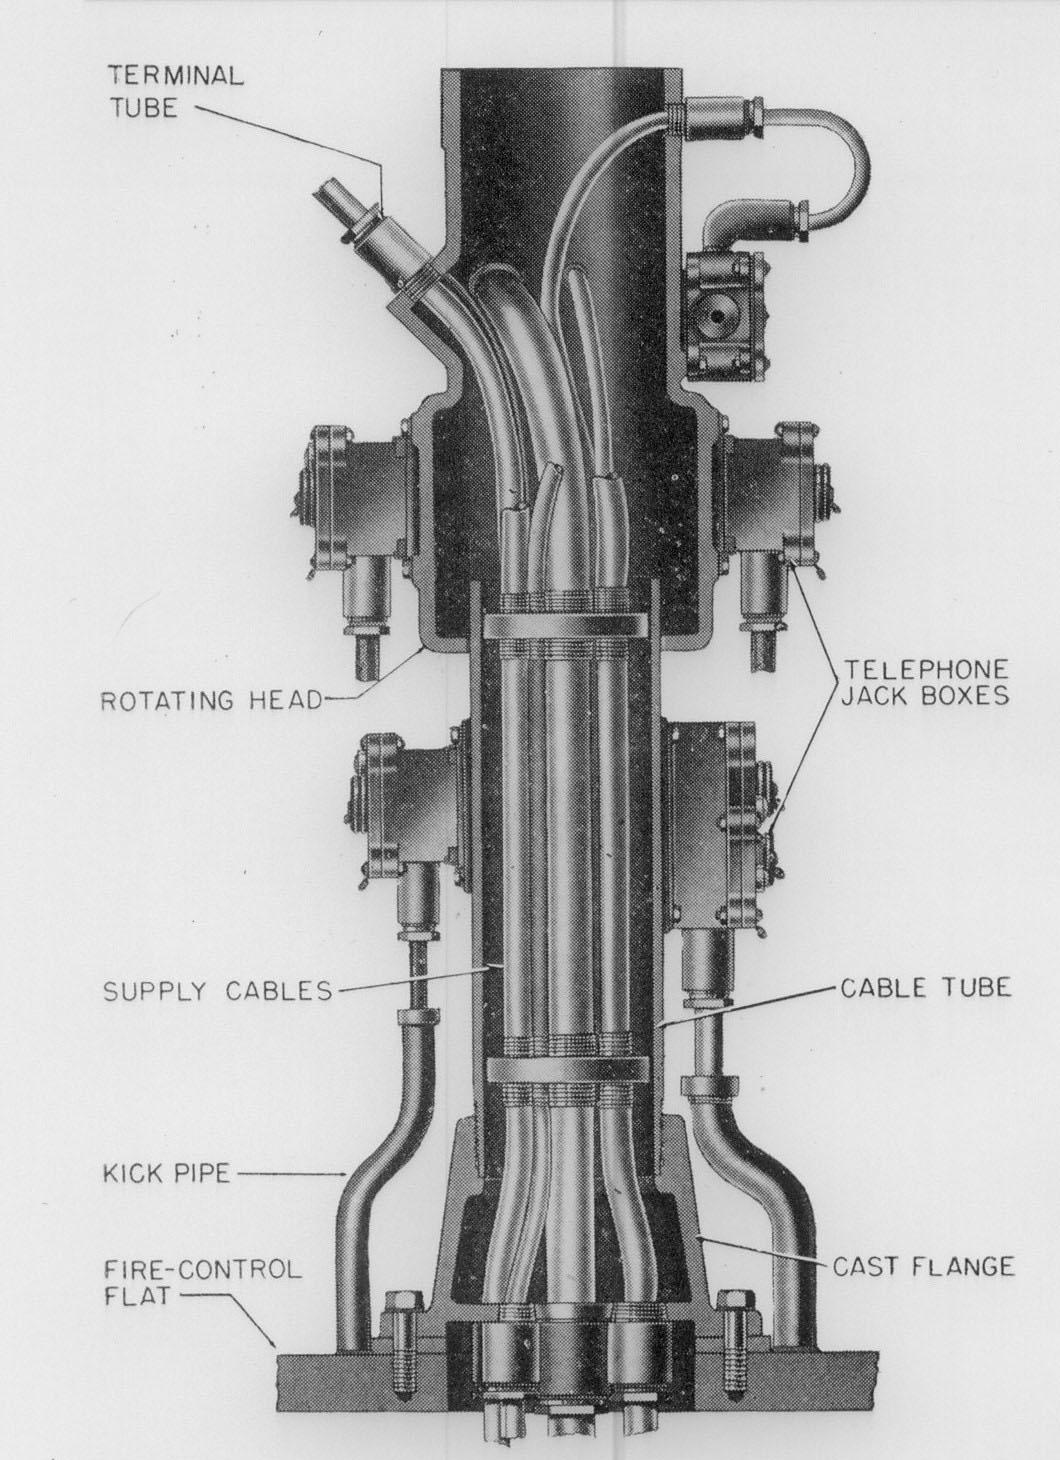 mk intermediate switch wiring diagram soft and woody stem description of gun directors 40 mods 1